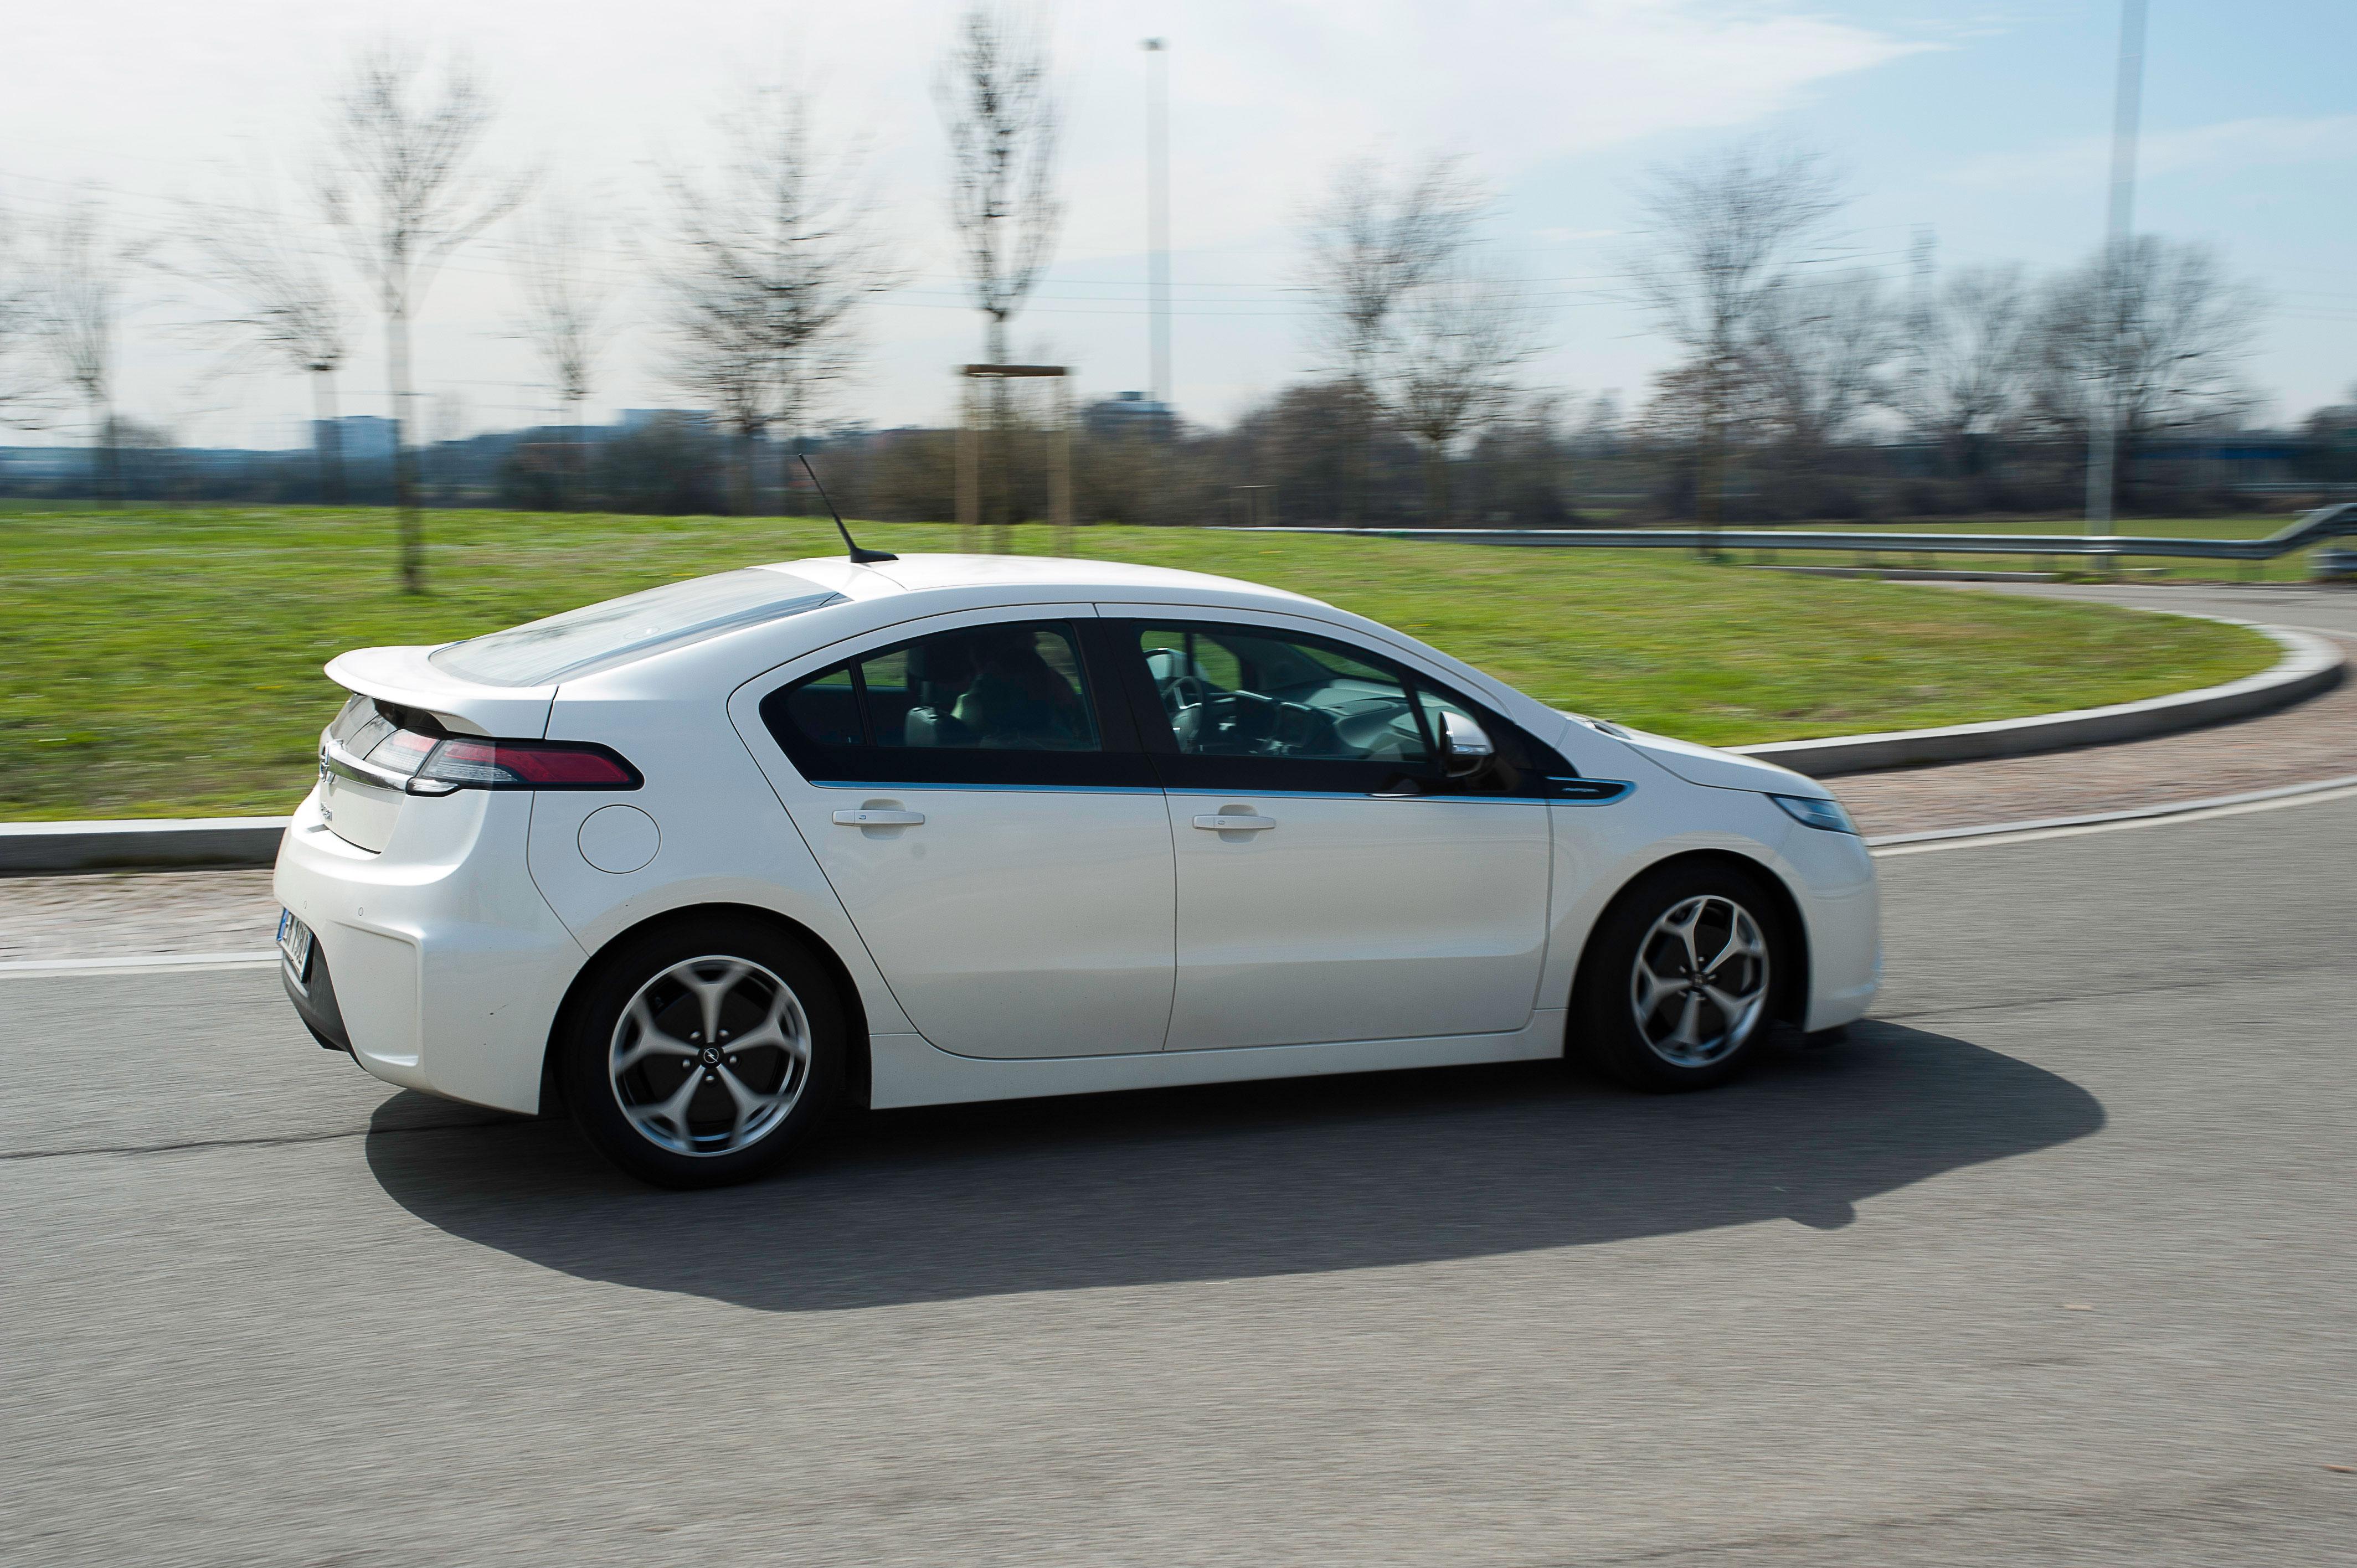 Opel Ampera Veicoli Elettrici News